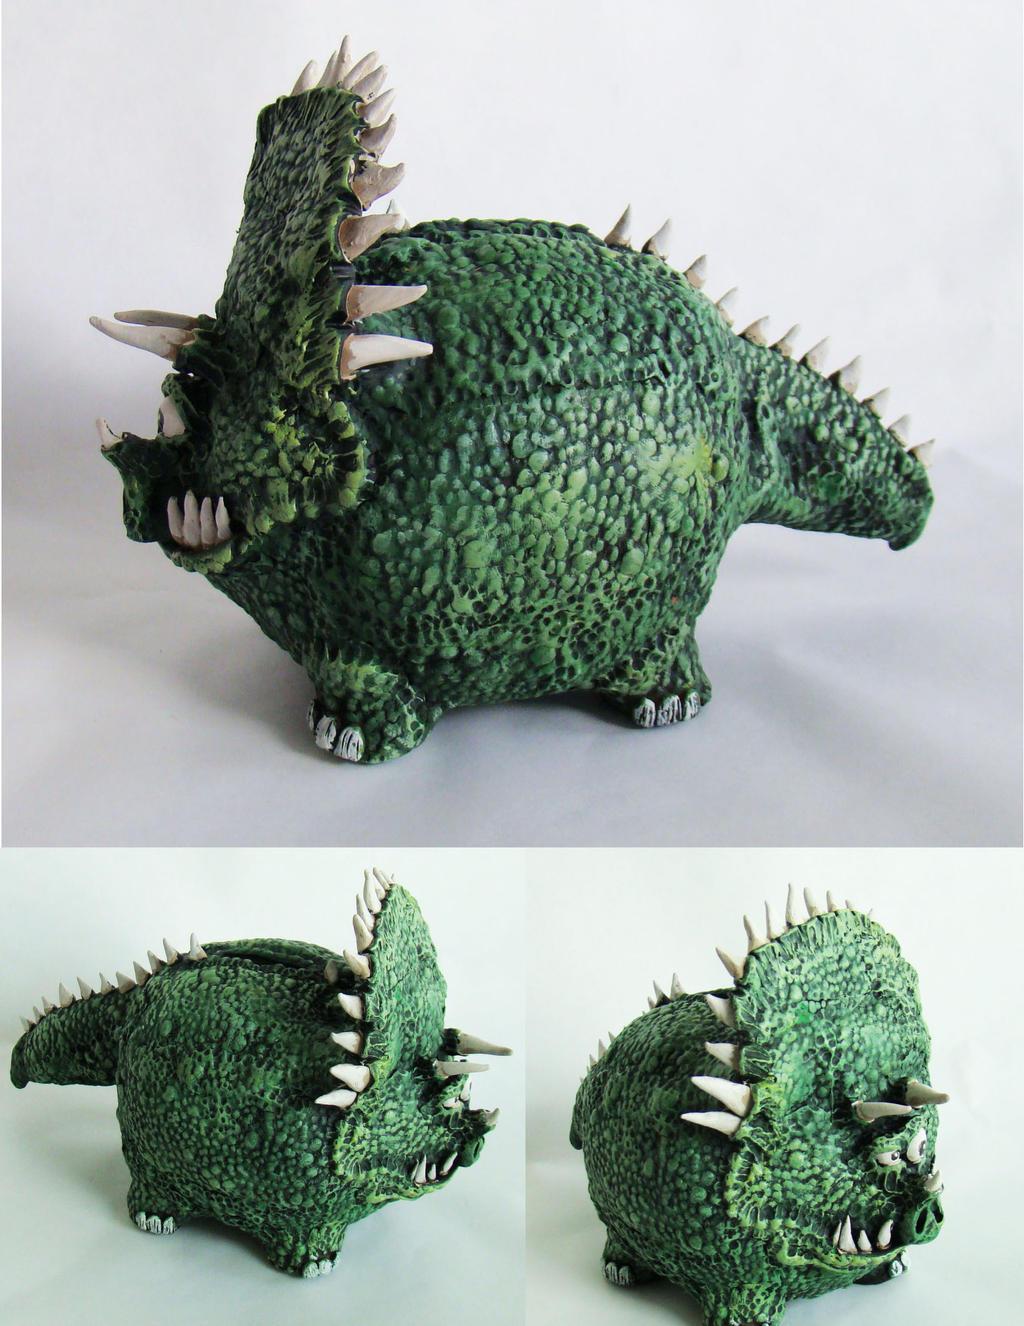 Dinosaur piggy bank by richardsymonsart on deviantart - Dinosaur piggy banks ...